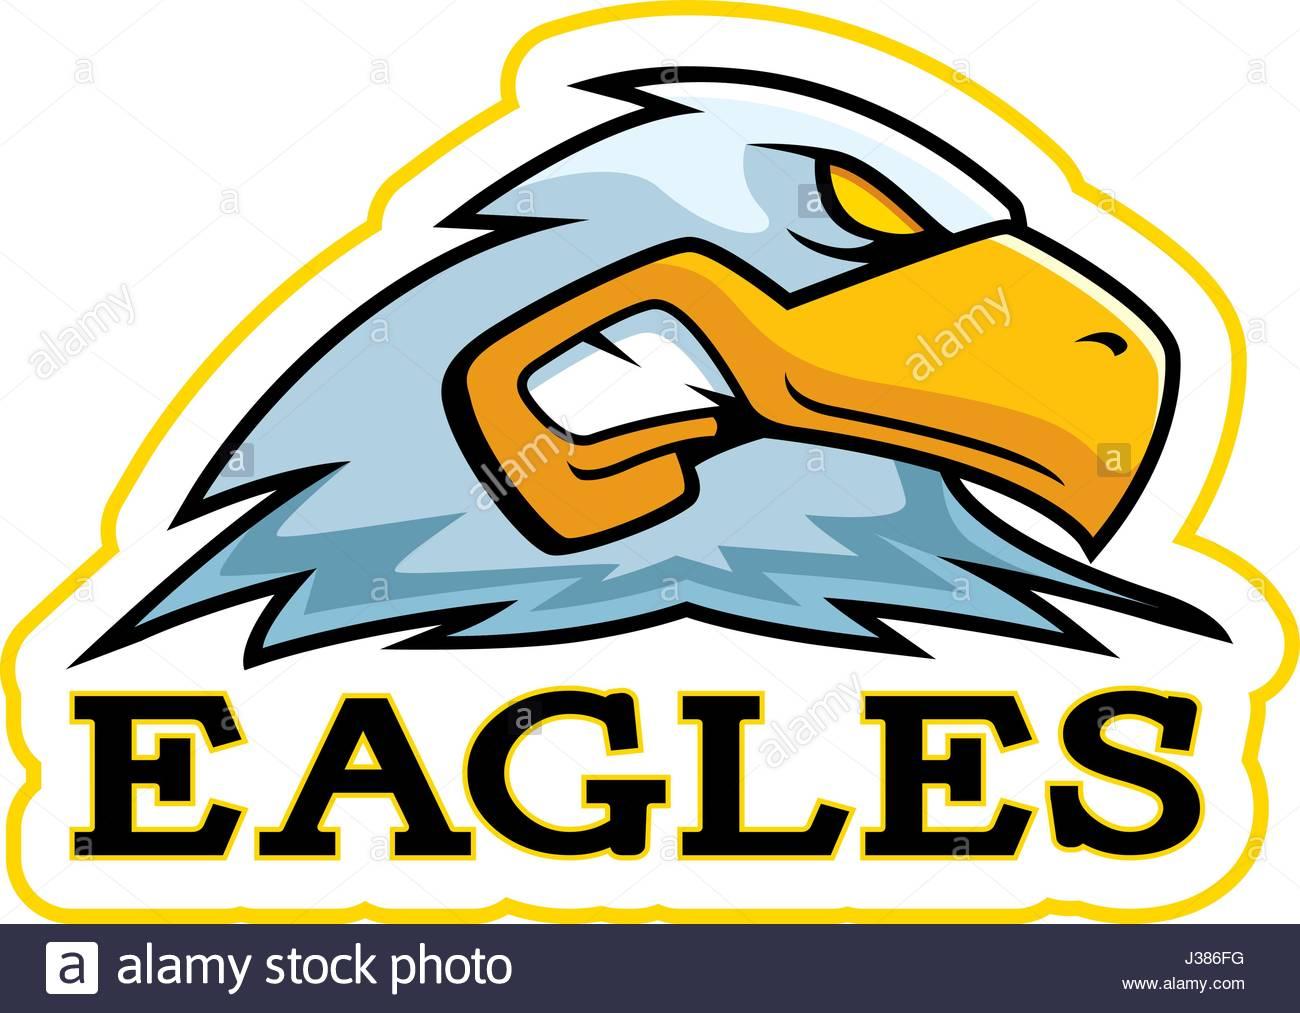 1300x1013 A Cartoon Illustration Of An Eagle Mascot Head Stock Vector Art